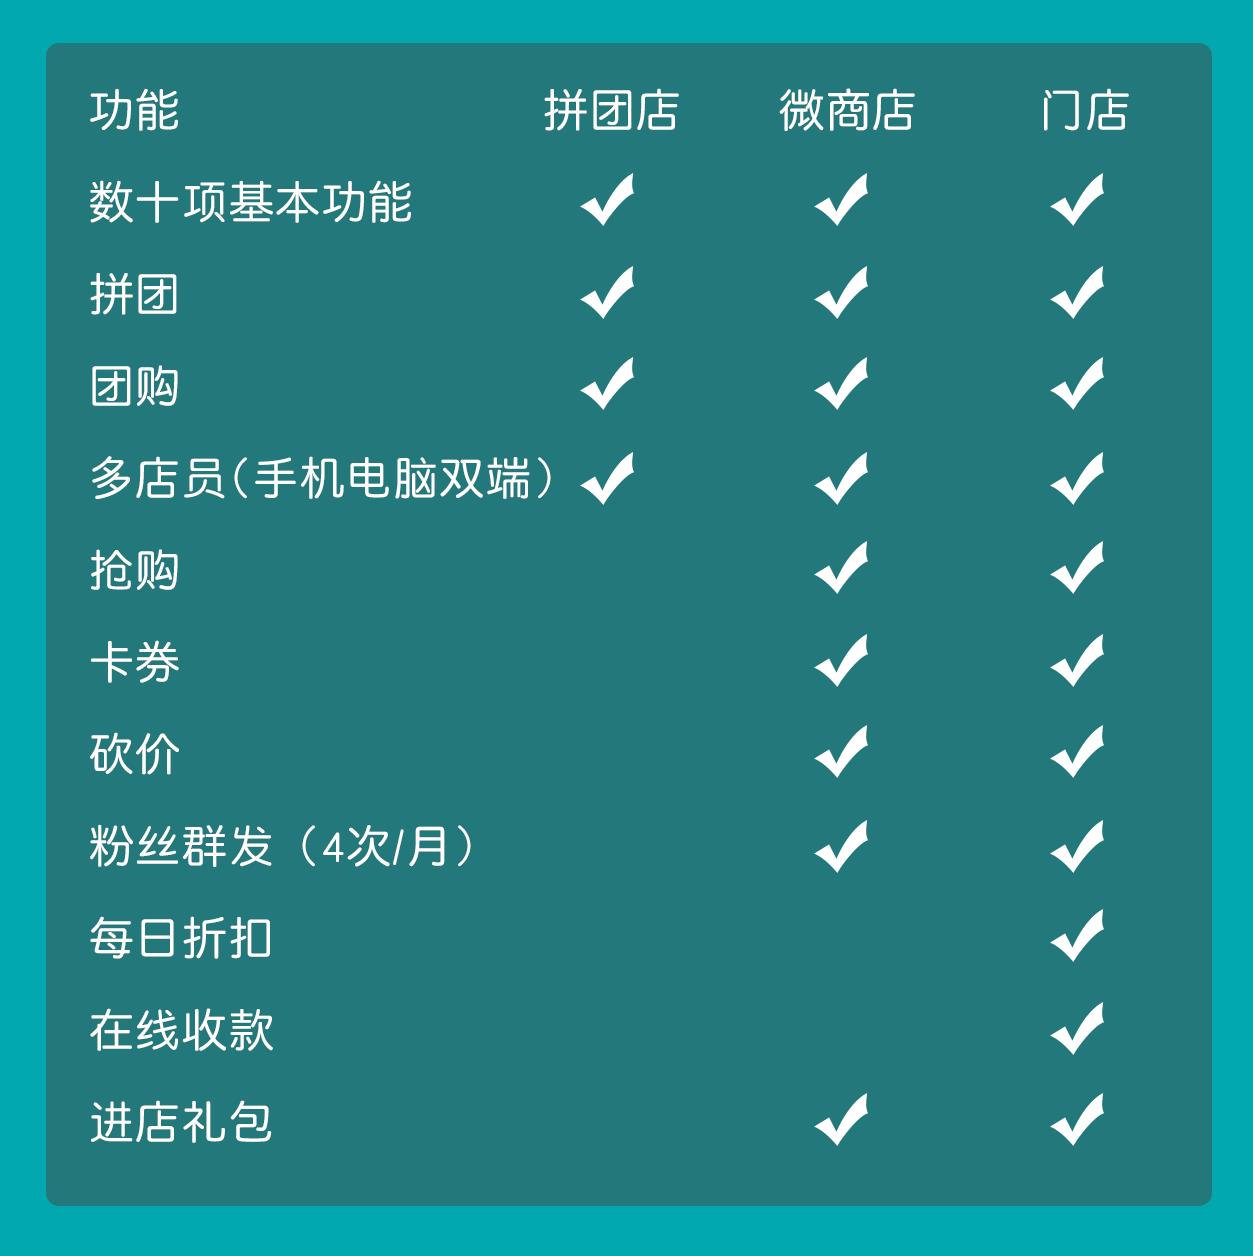 BOO社区微商店(门店收费说明三大商业_02.png